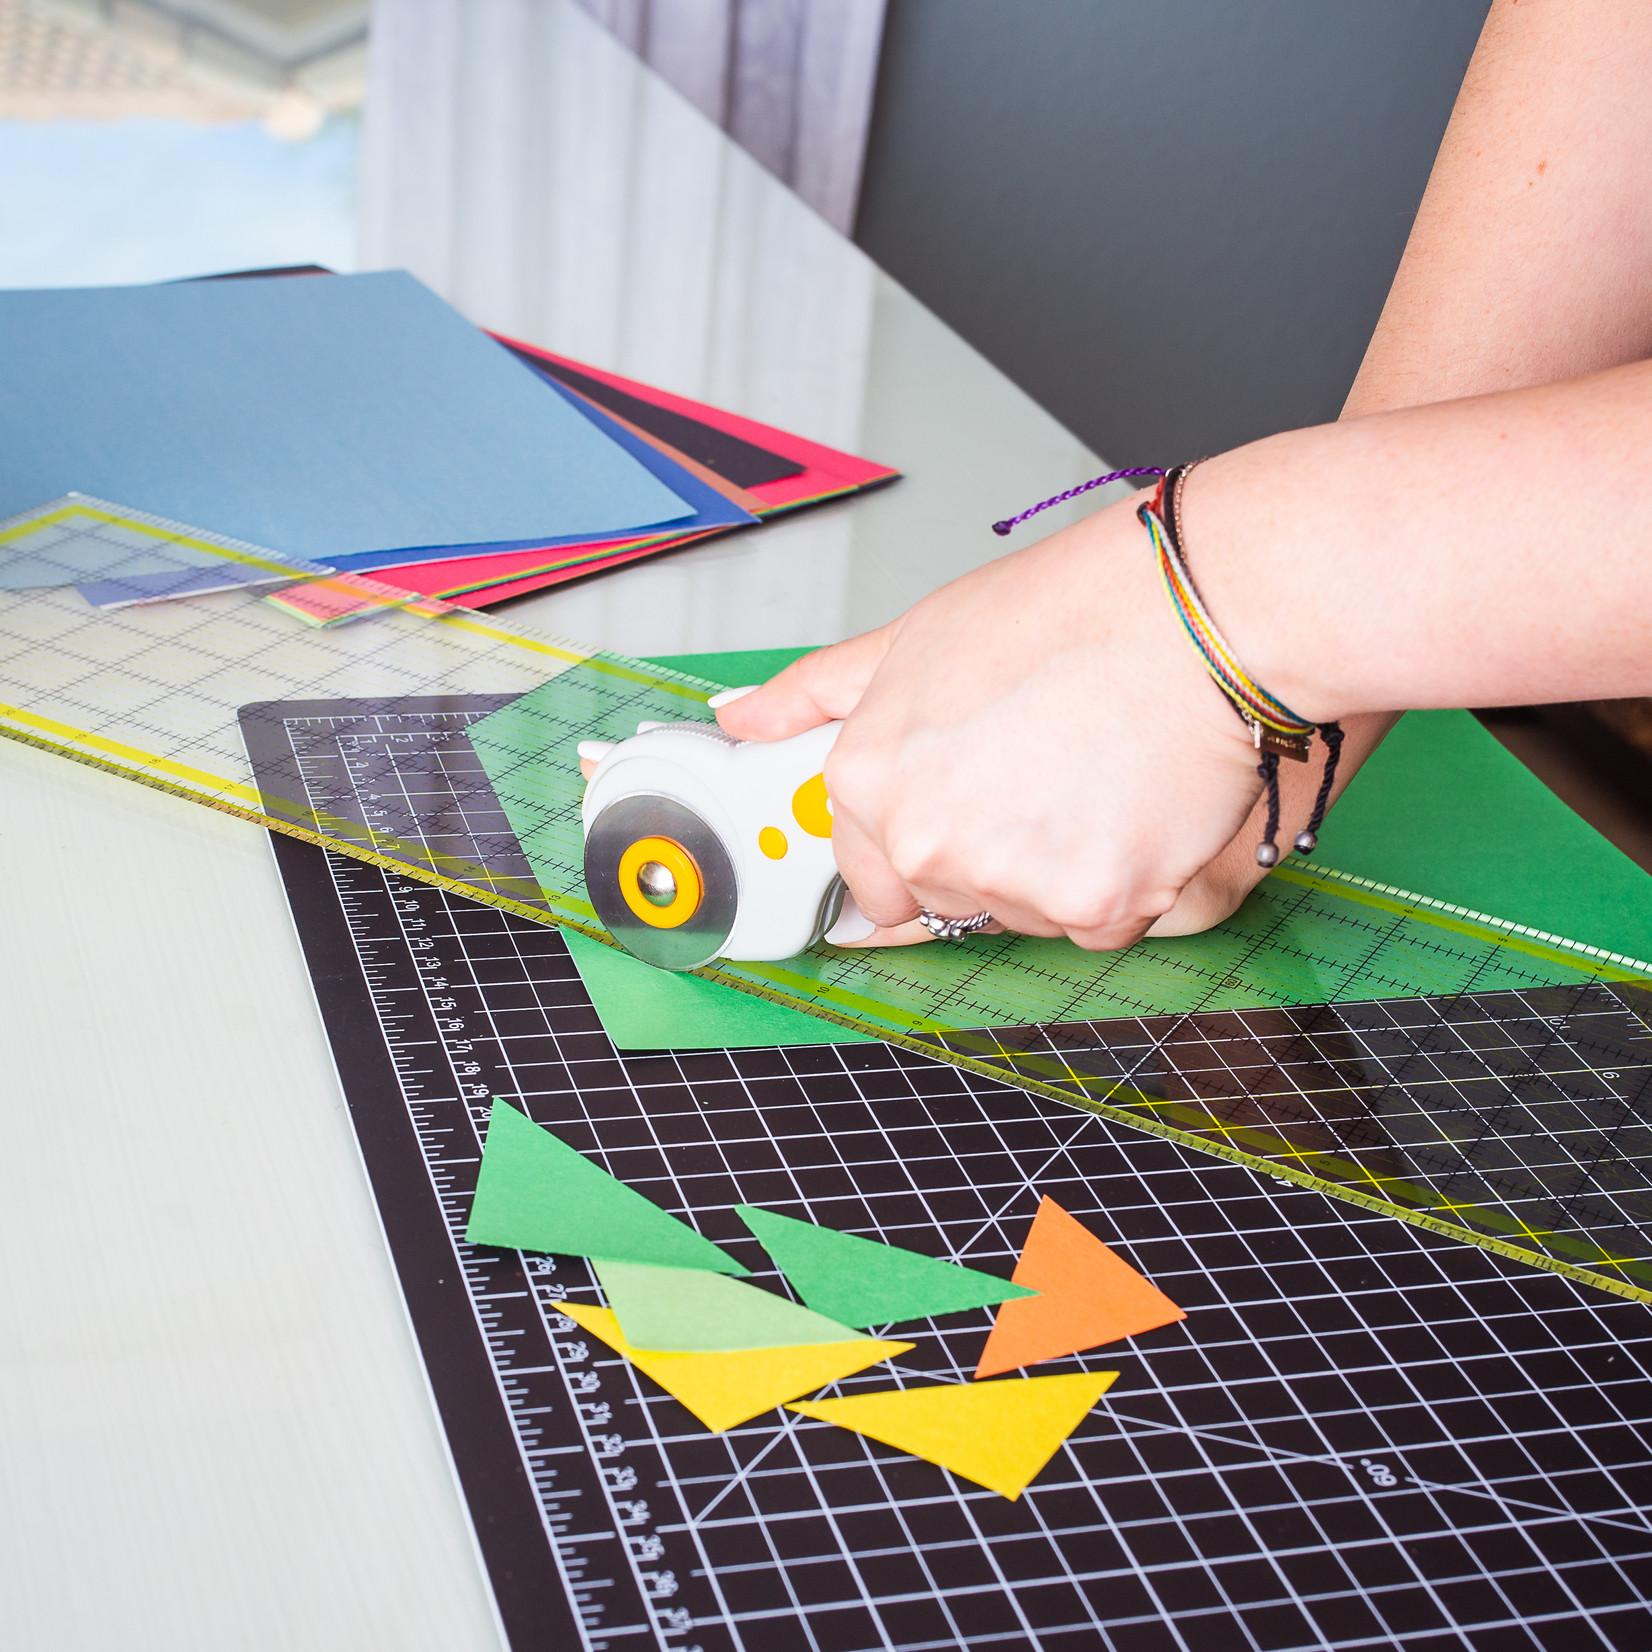 W.A. Portman W.A. Portman 45mm Rotary Fabric Cutter w/5 Replacement Blades & Cutting Mat (9x12, 12x18, 18x24, 24x36)